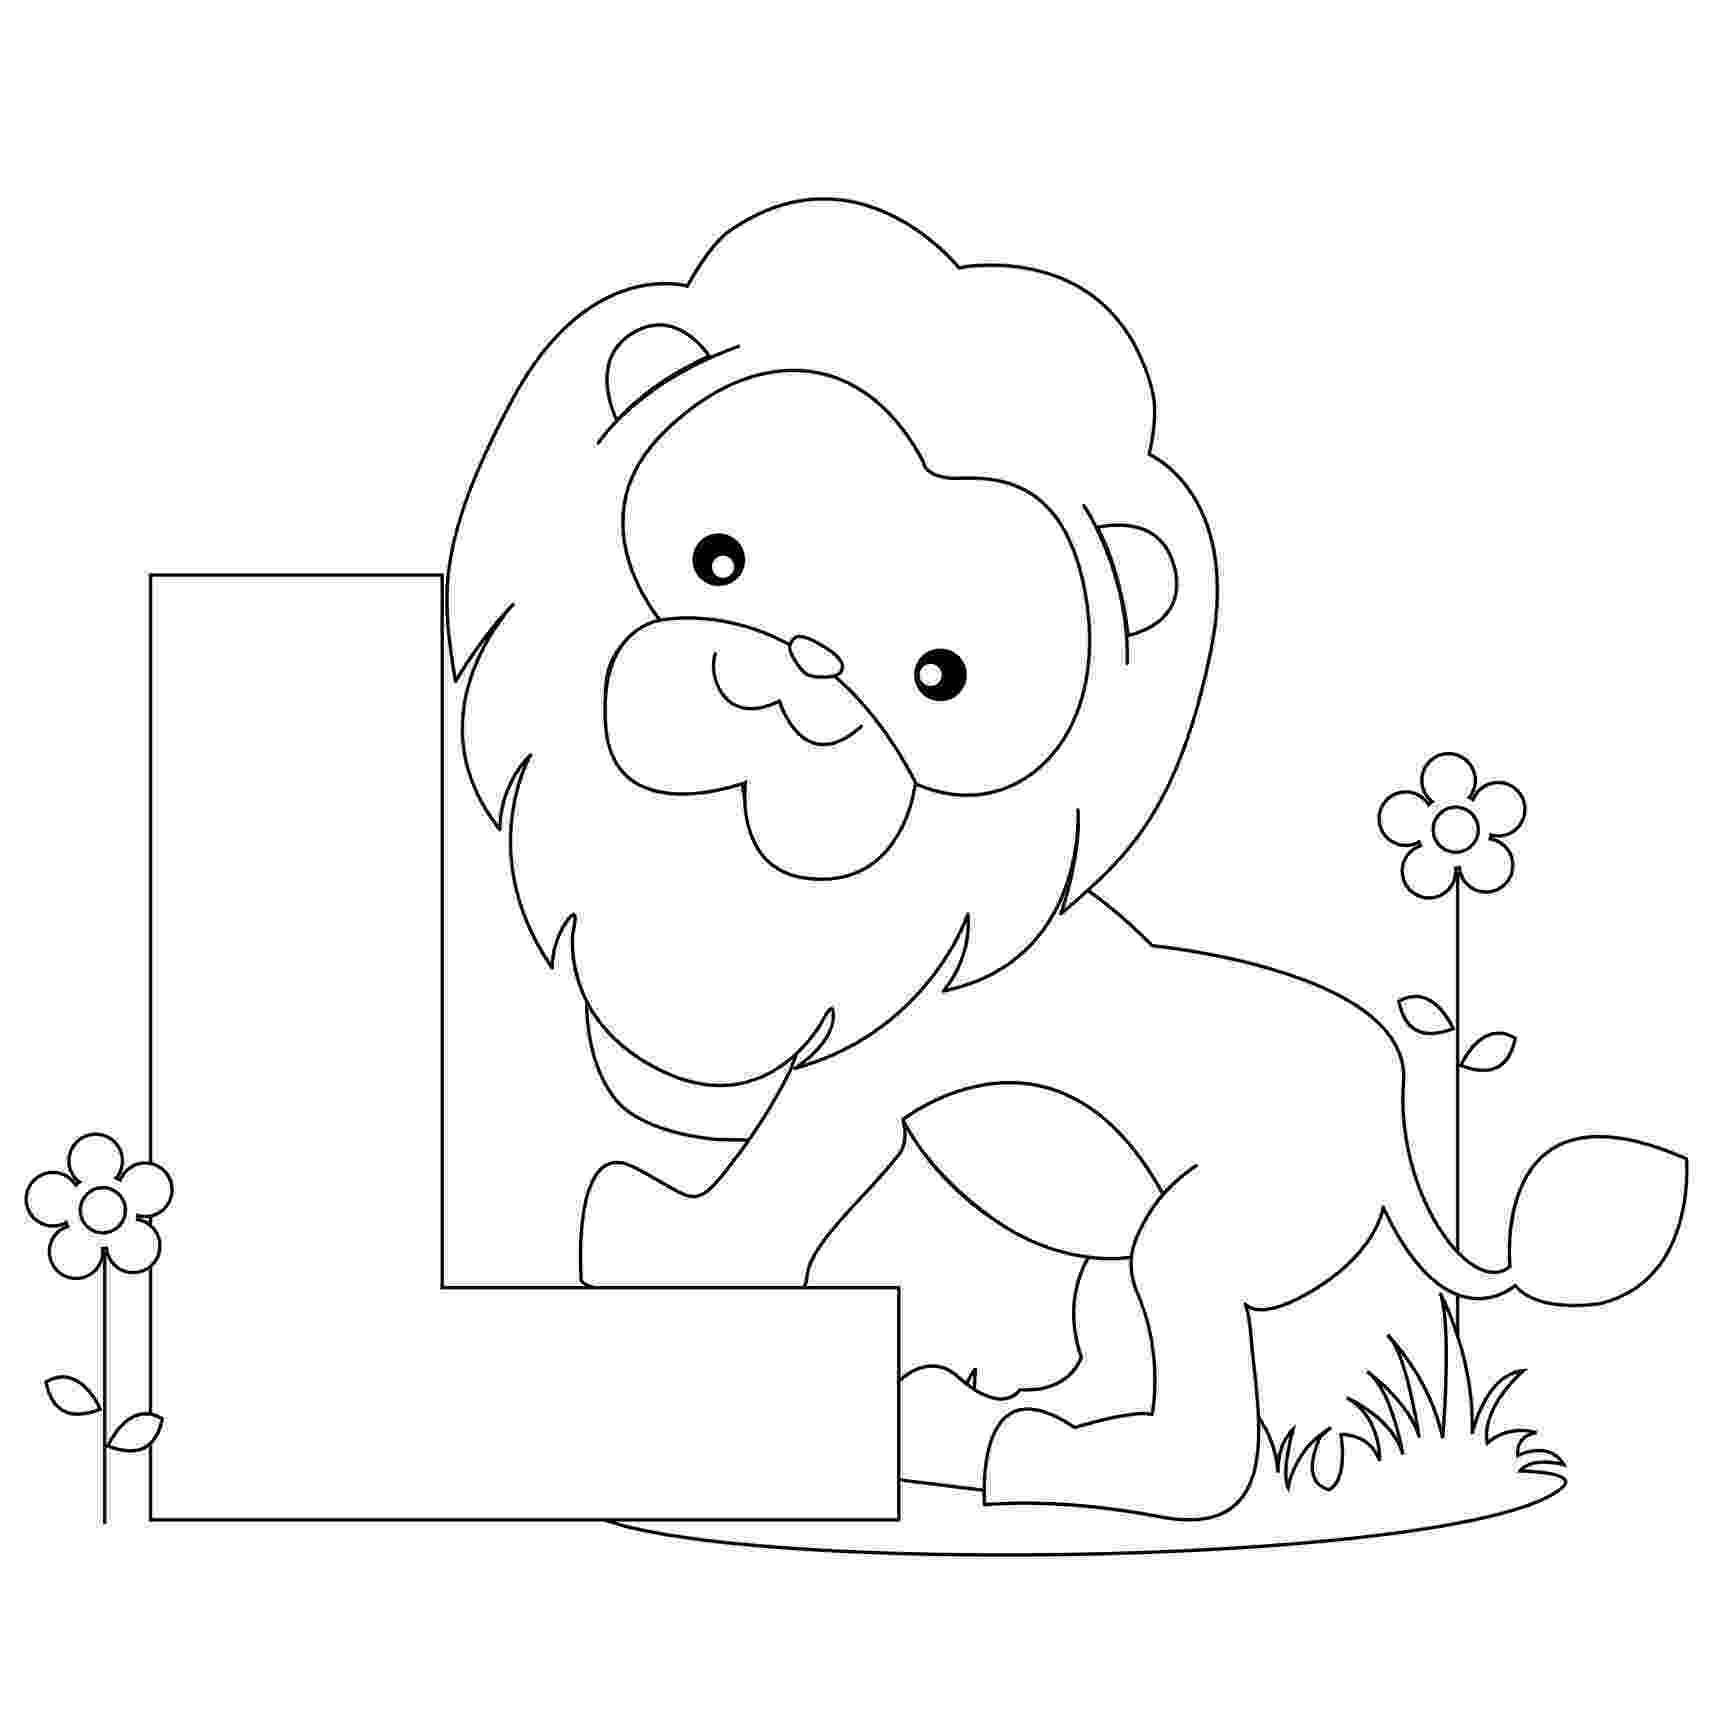 coloring animal alphabet free printable alphabet coloring pages for kids best alphabet coloring animal